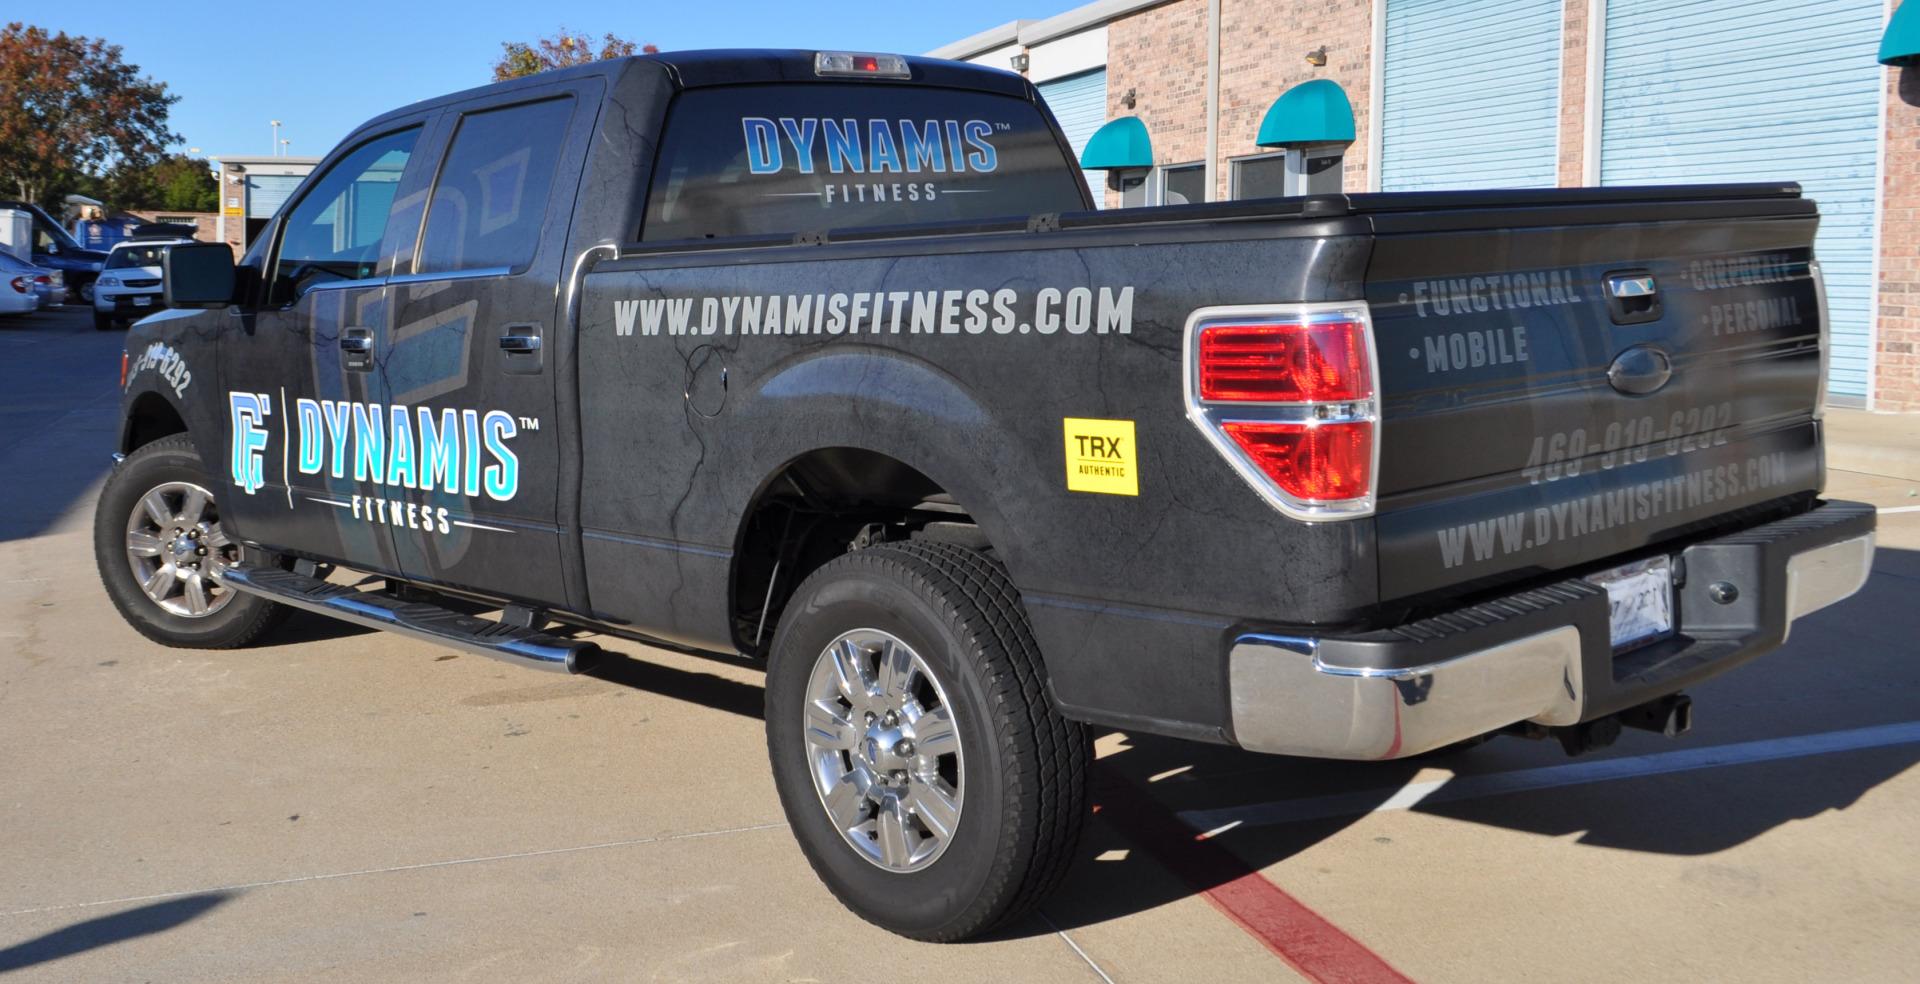 Dynamis Fitness